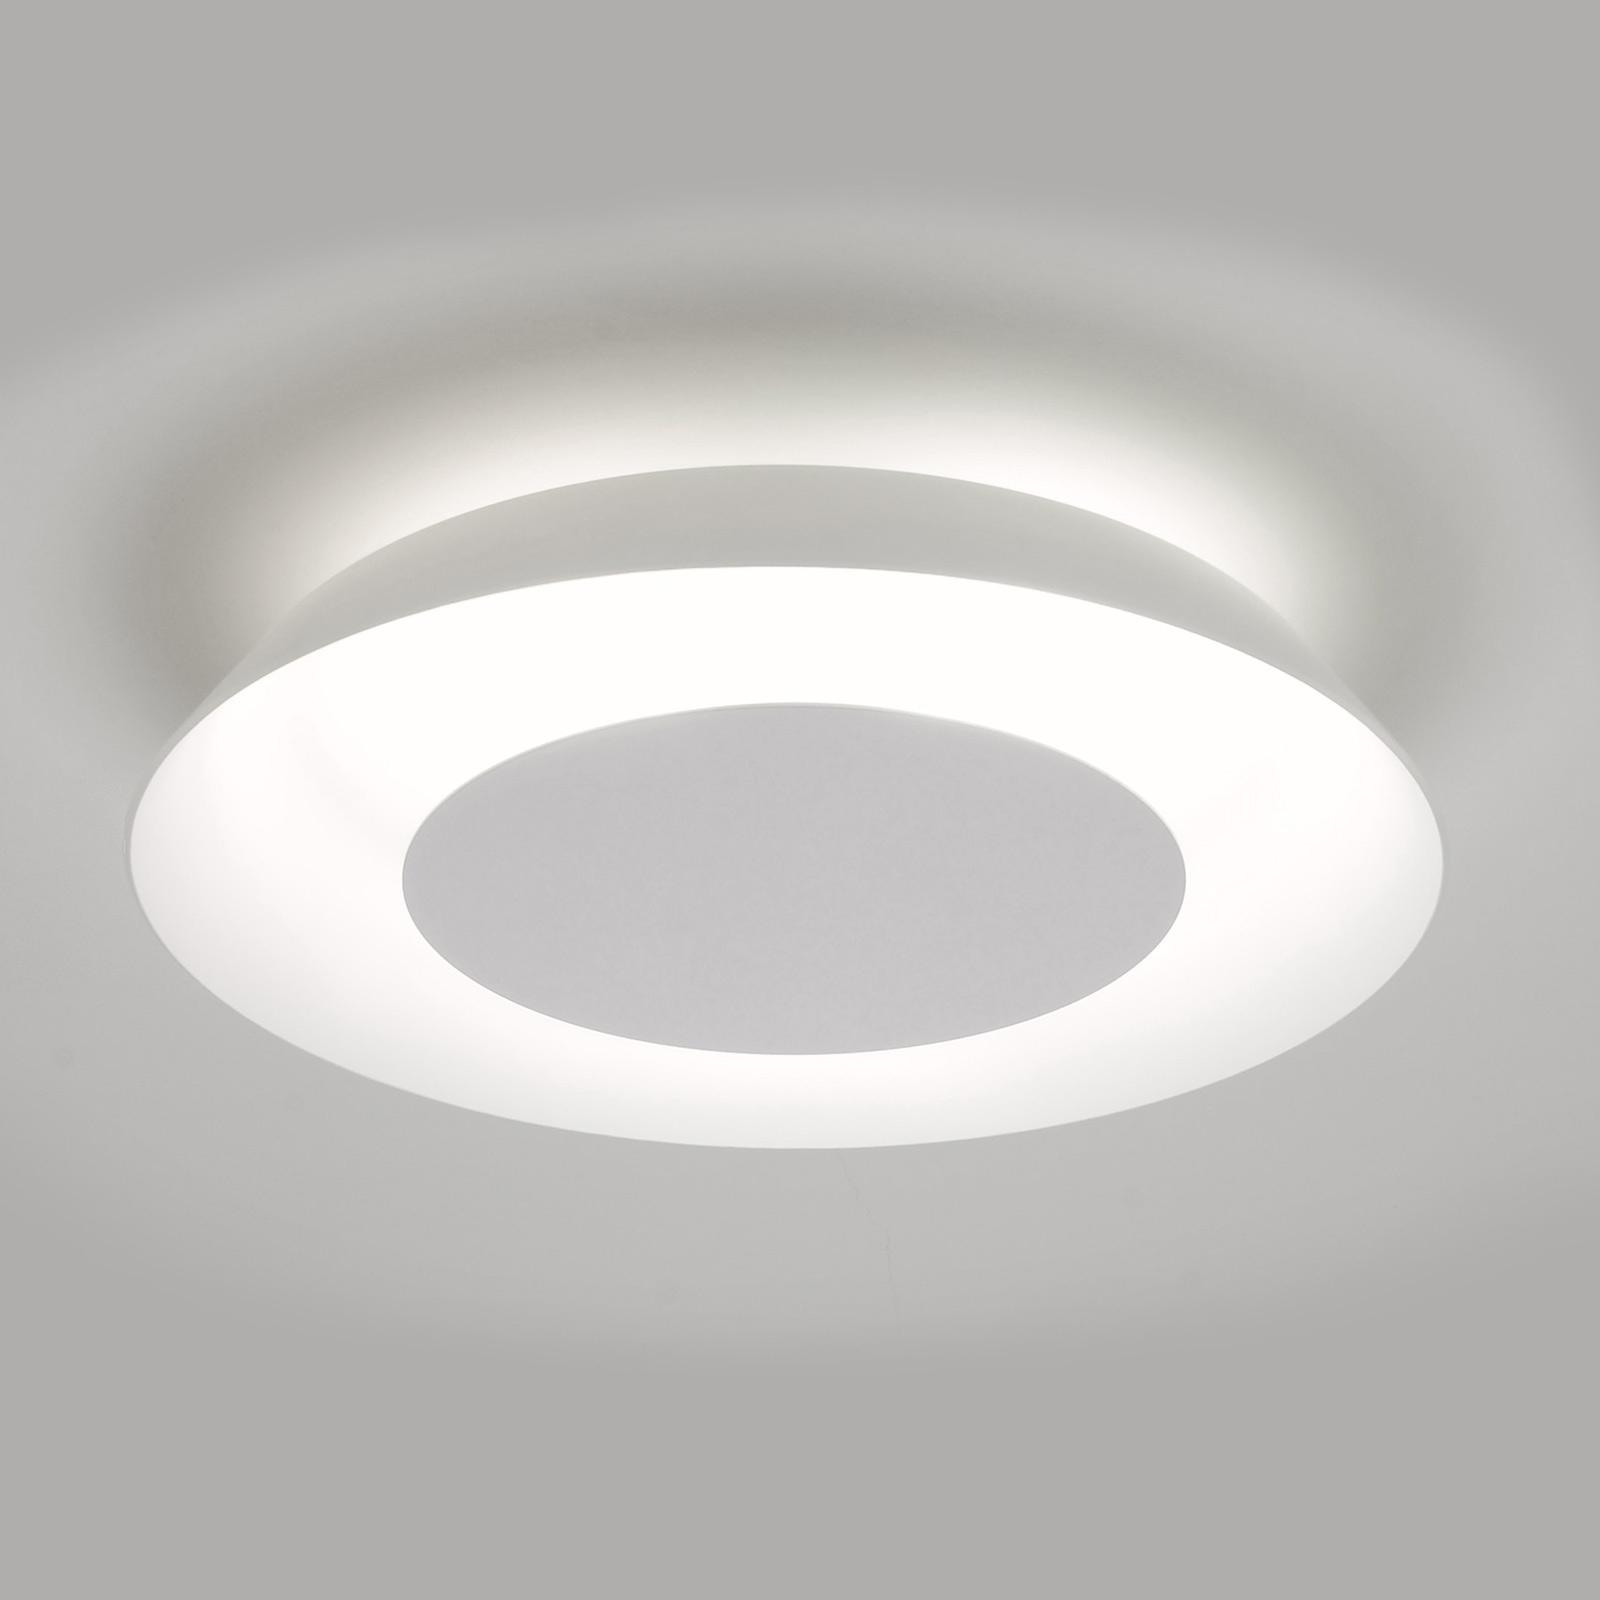 Casablanca Torno plafonnier LED, Ø 40cm